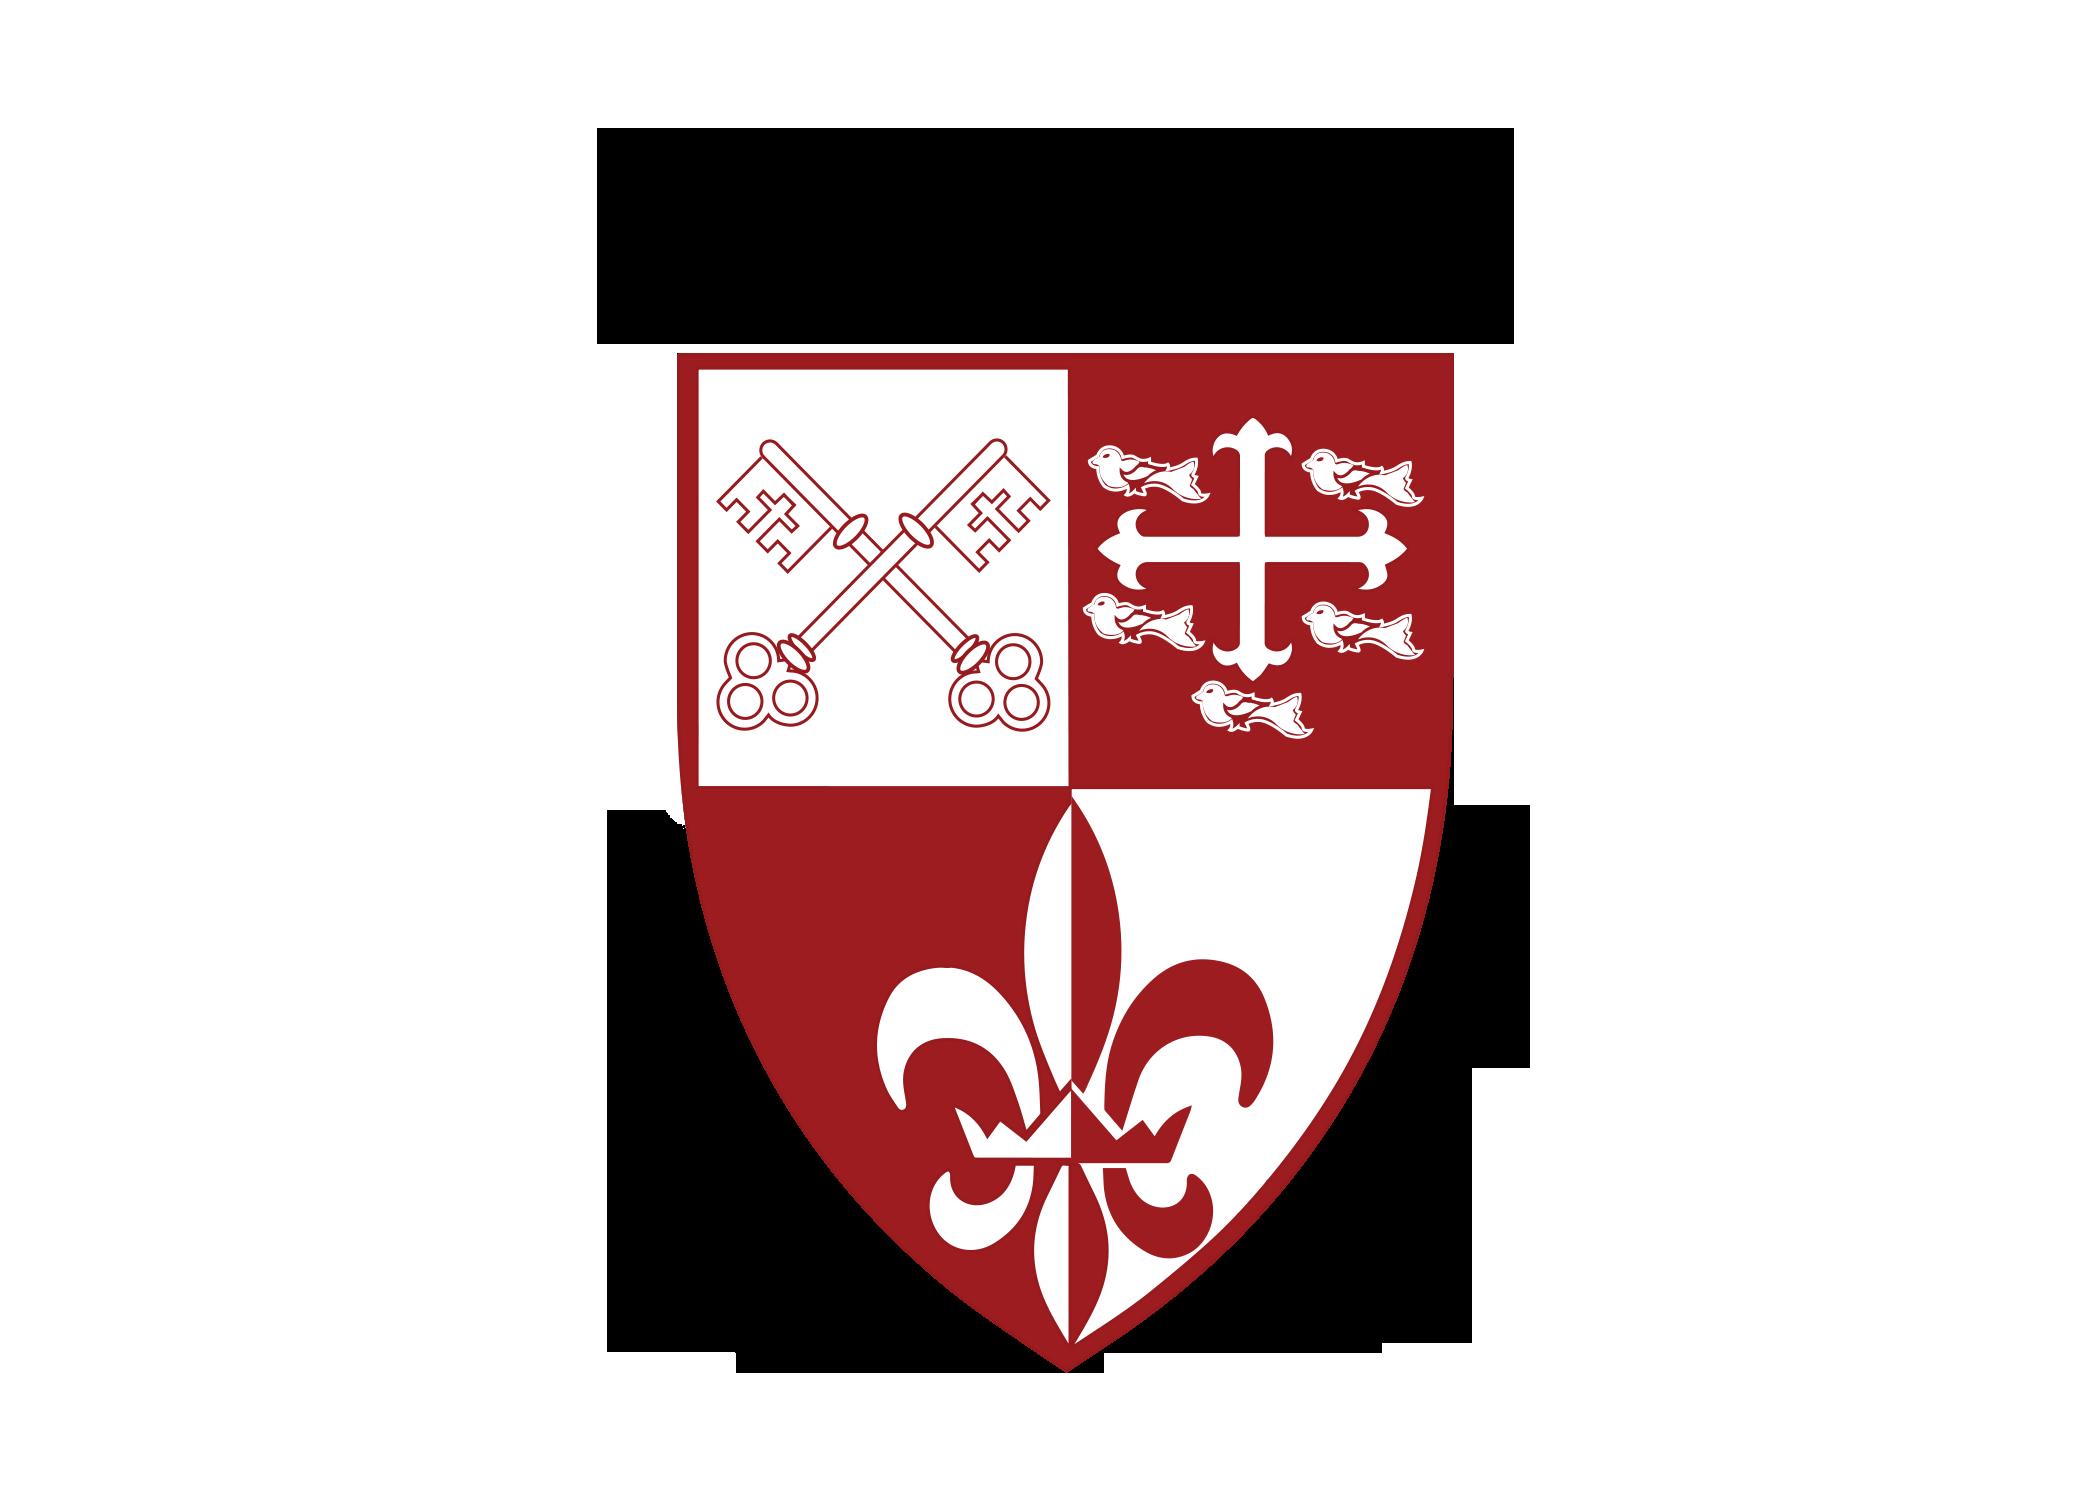 St Alban Roe Catholic School